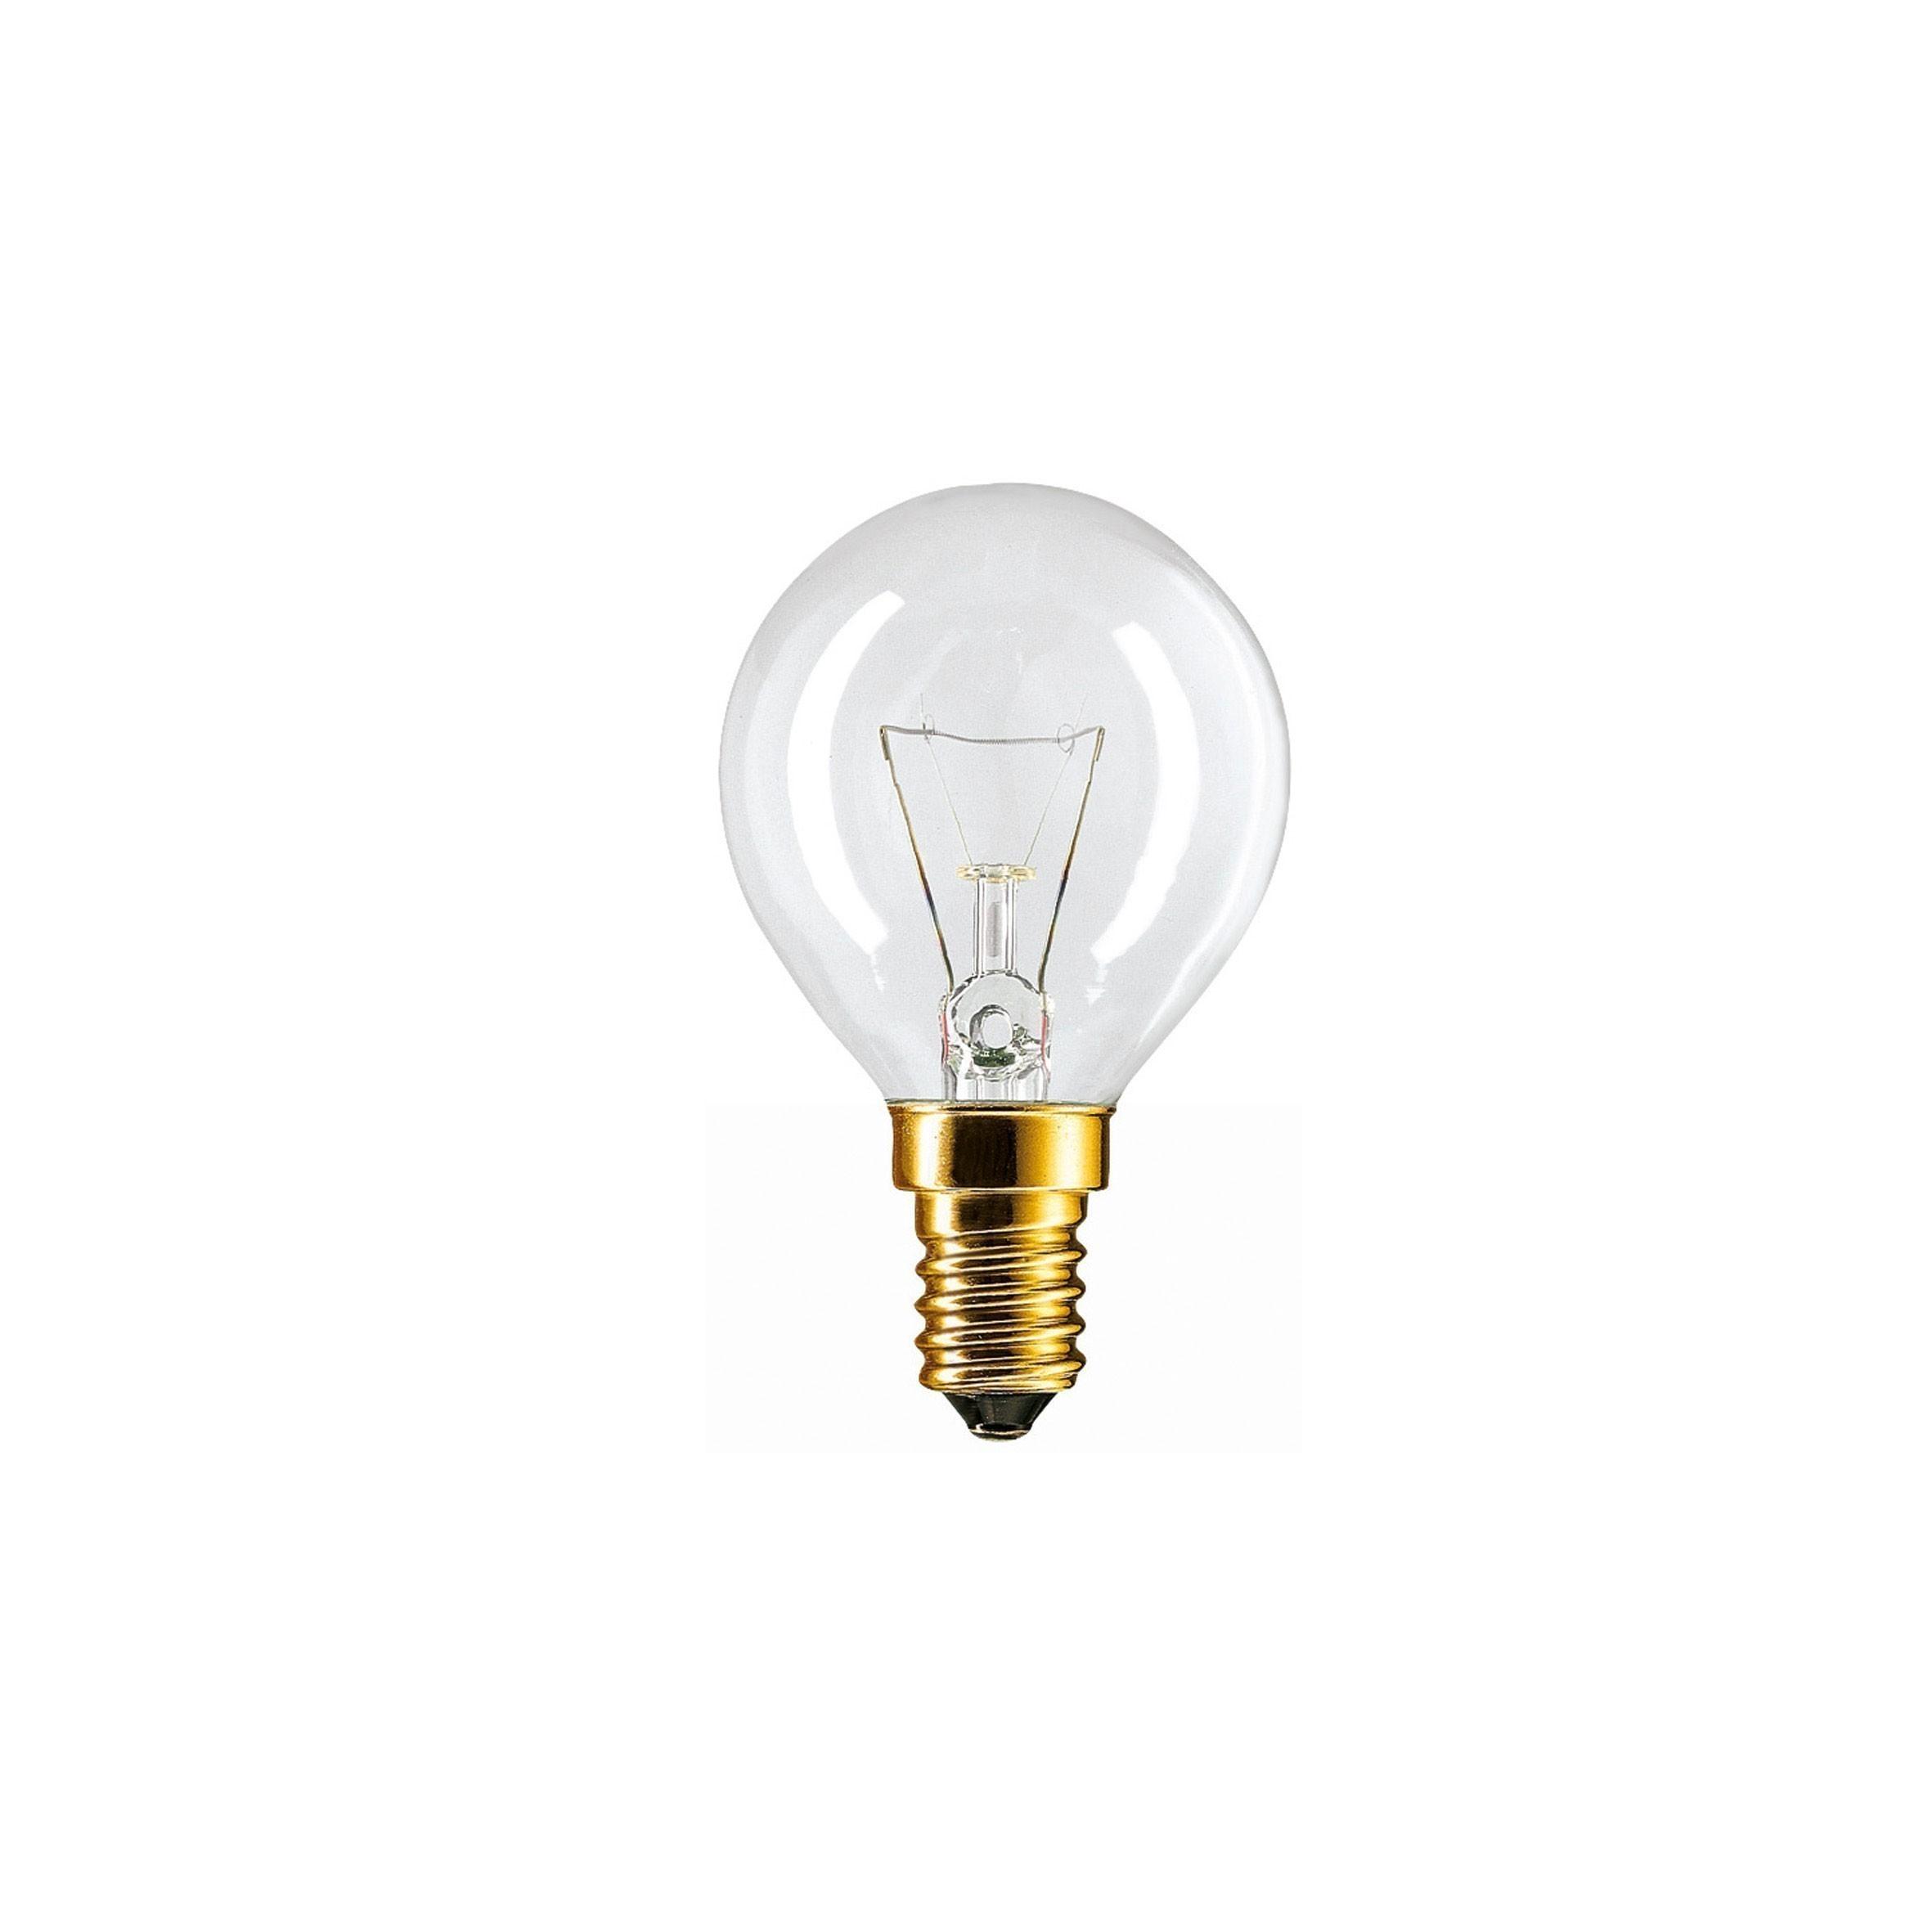 Philips Spezialglühlampe für Ofen / Backofenlampe P45 E14 40W Bild 1